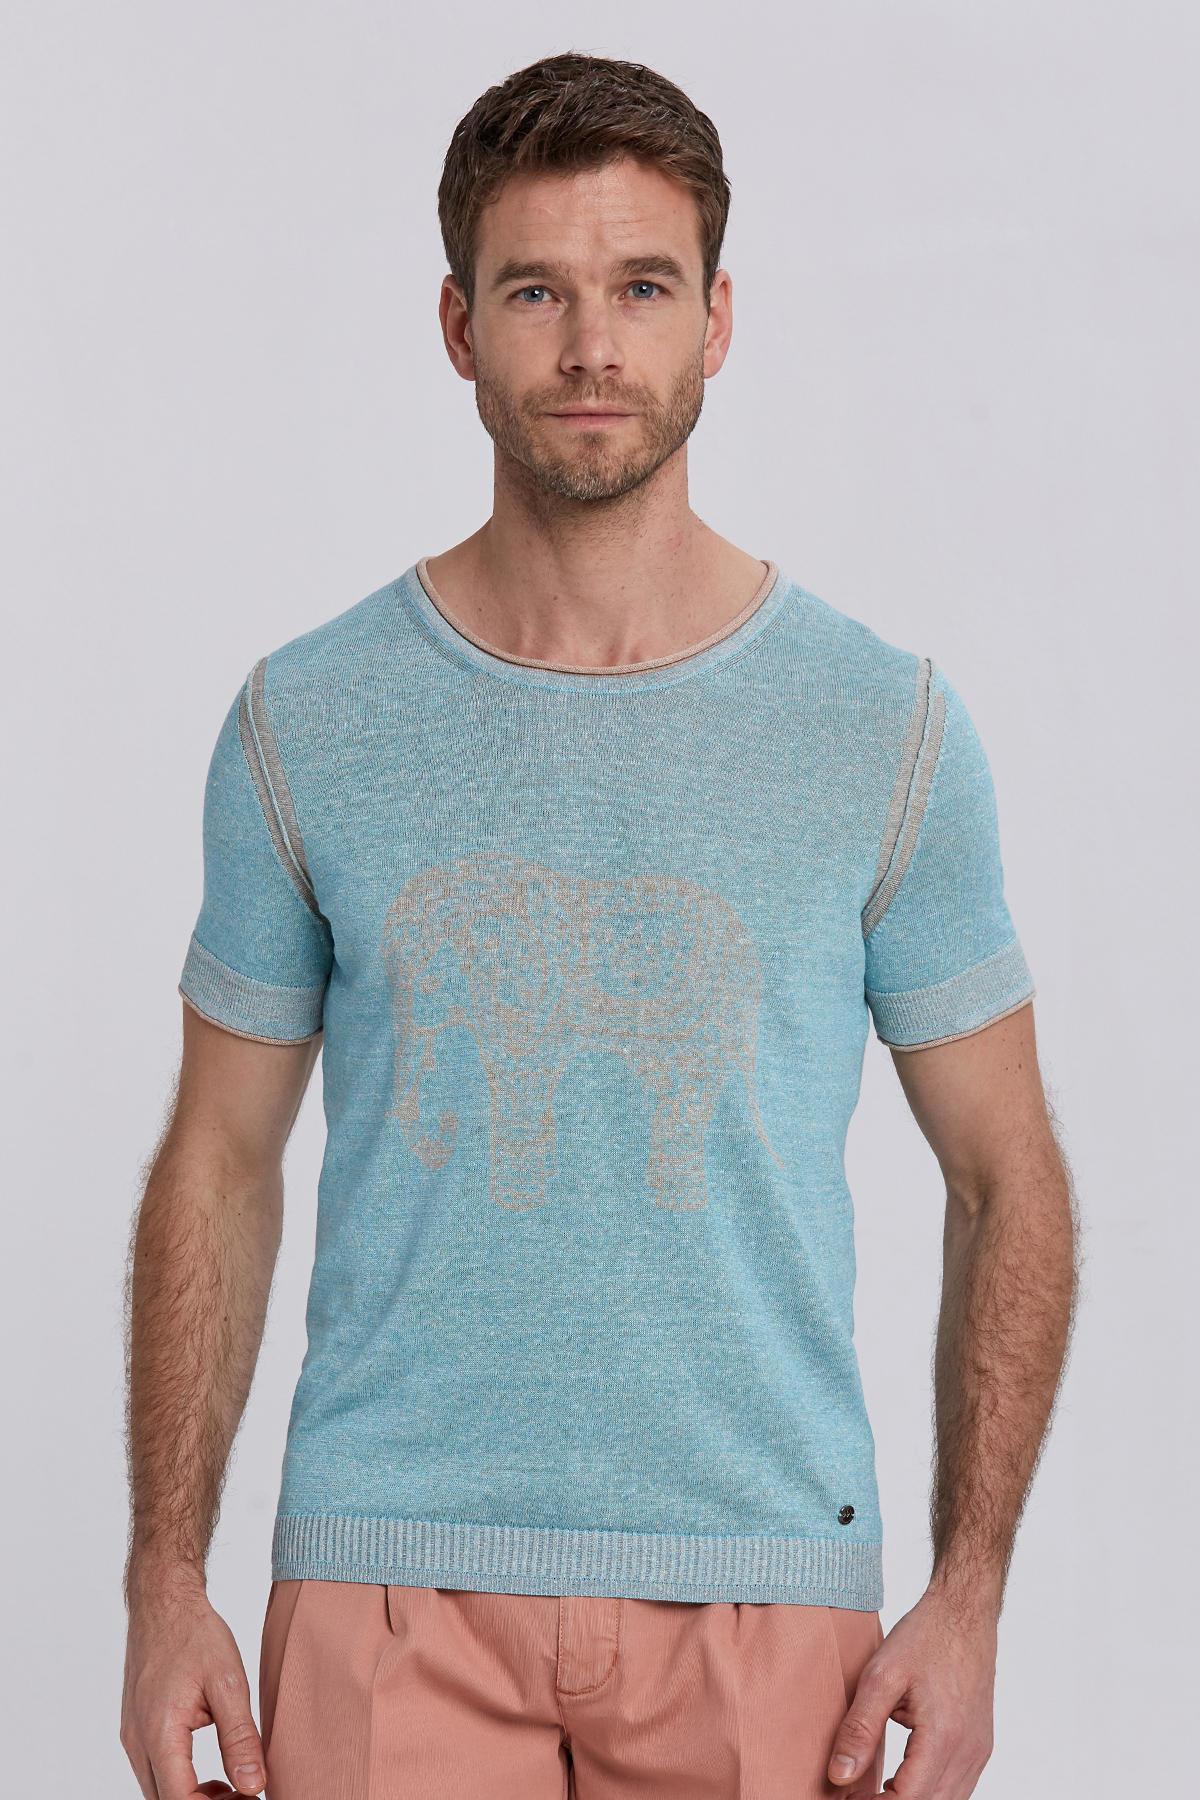 Desenli Turkuaz Keten Pamuk Triko T-Shirt